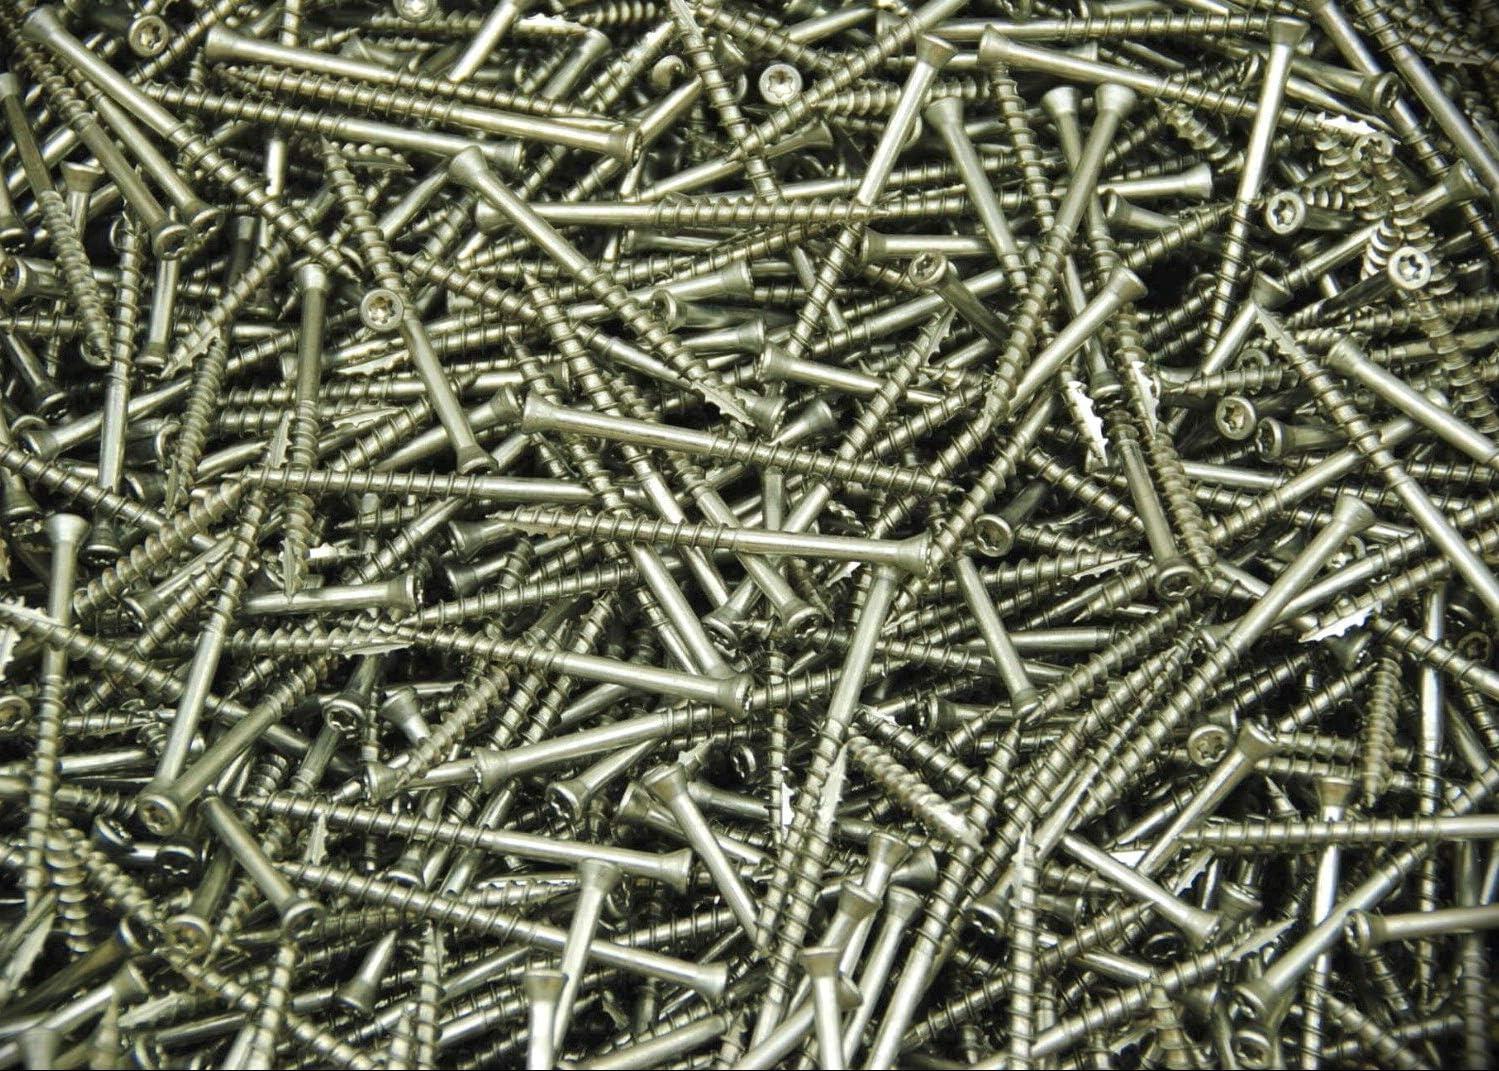 Stainless Steel Torx Flat Trim Head 7 x 3 Wood Screw Type 17 Star T15 200